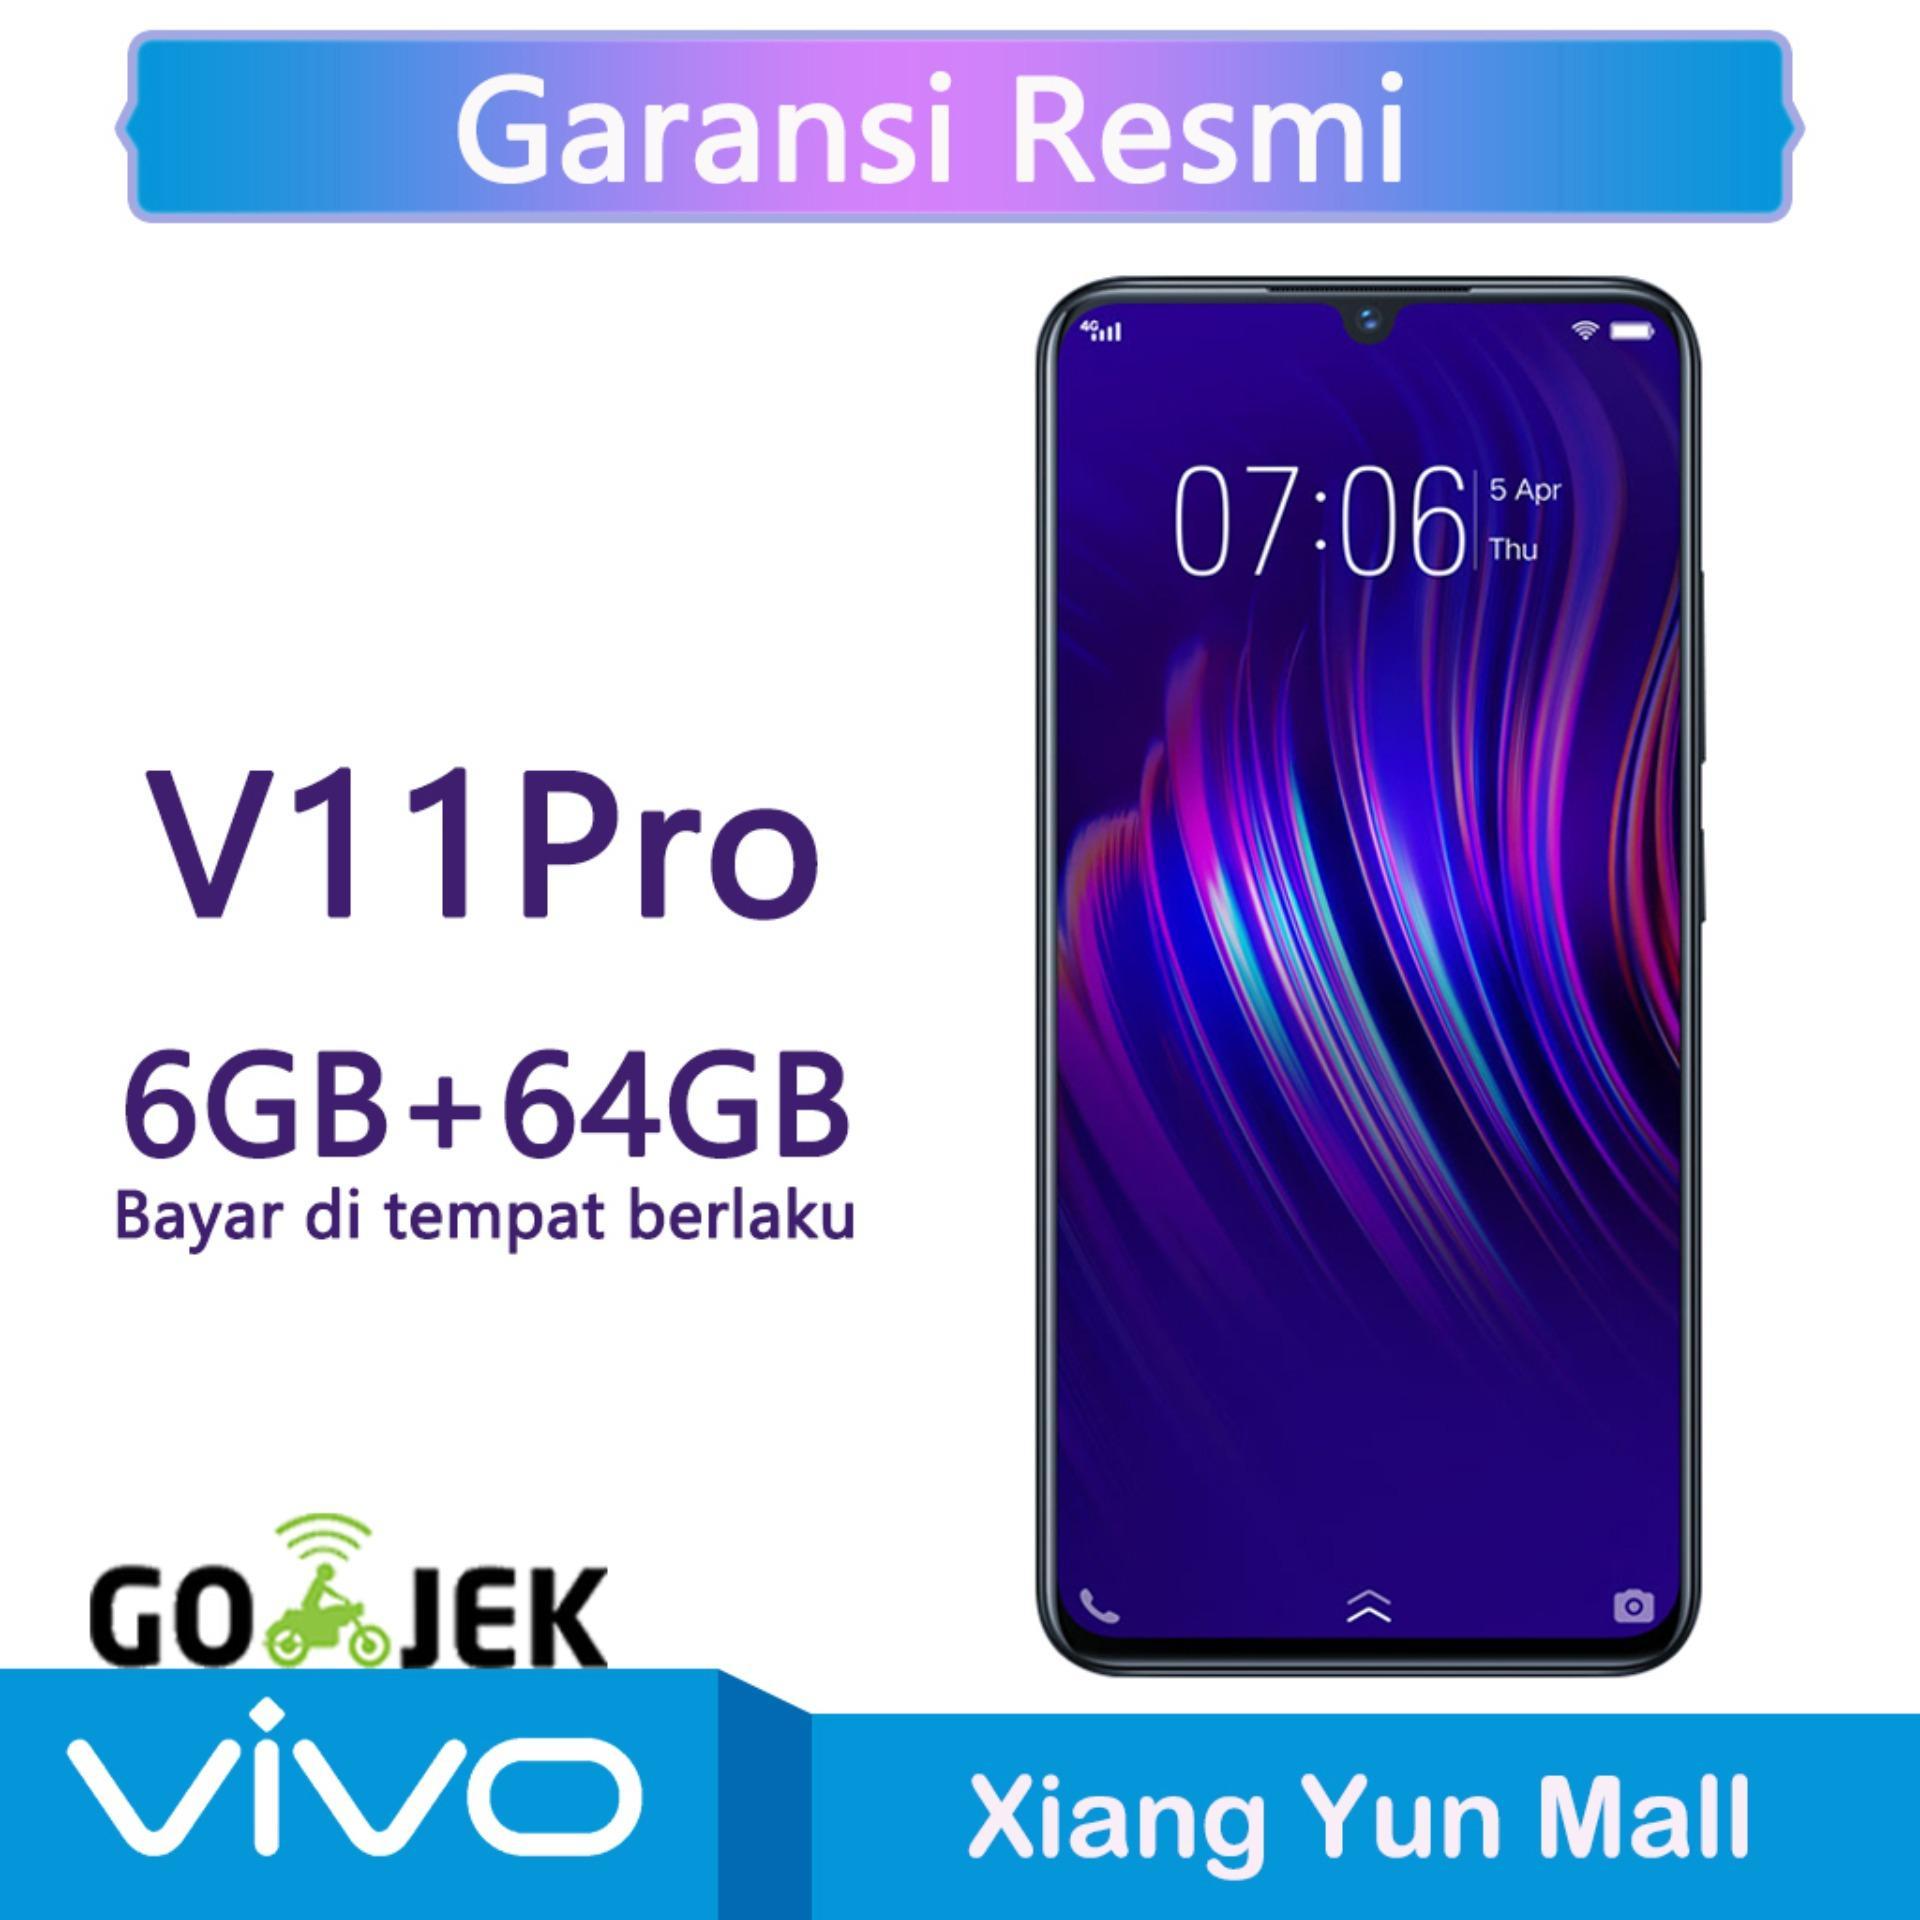 Handphone Smartphone Vivo Terbaru Y51 Ram 2 Gb Internal 16gb Garansi Resmi V11 Pro 6g 64g Screen Touch Id Ai Dual Rear Camera